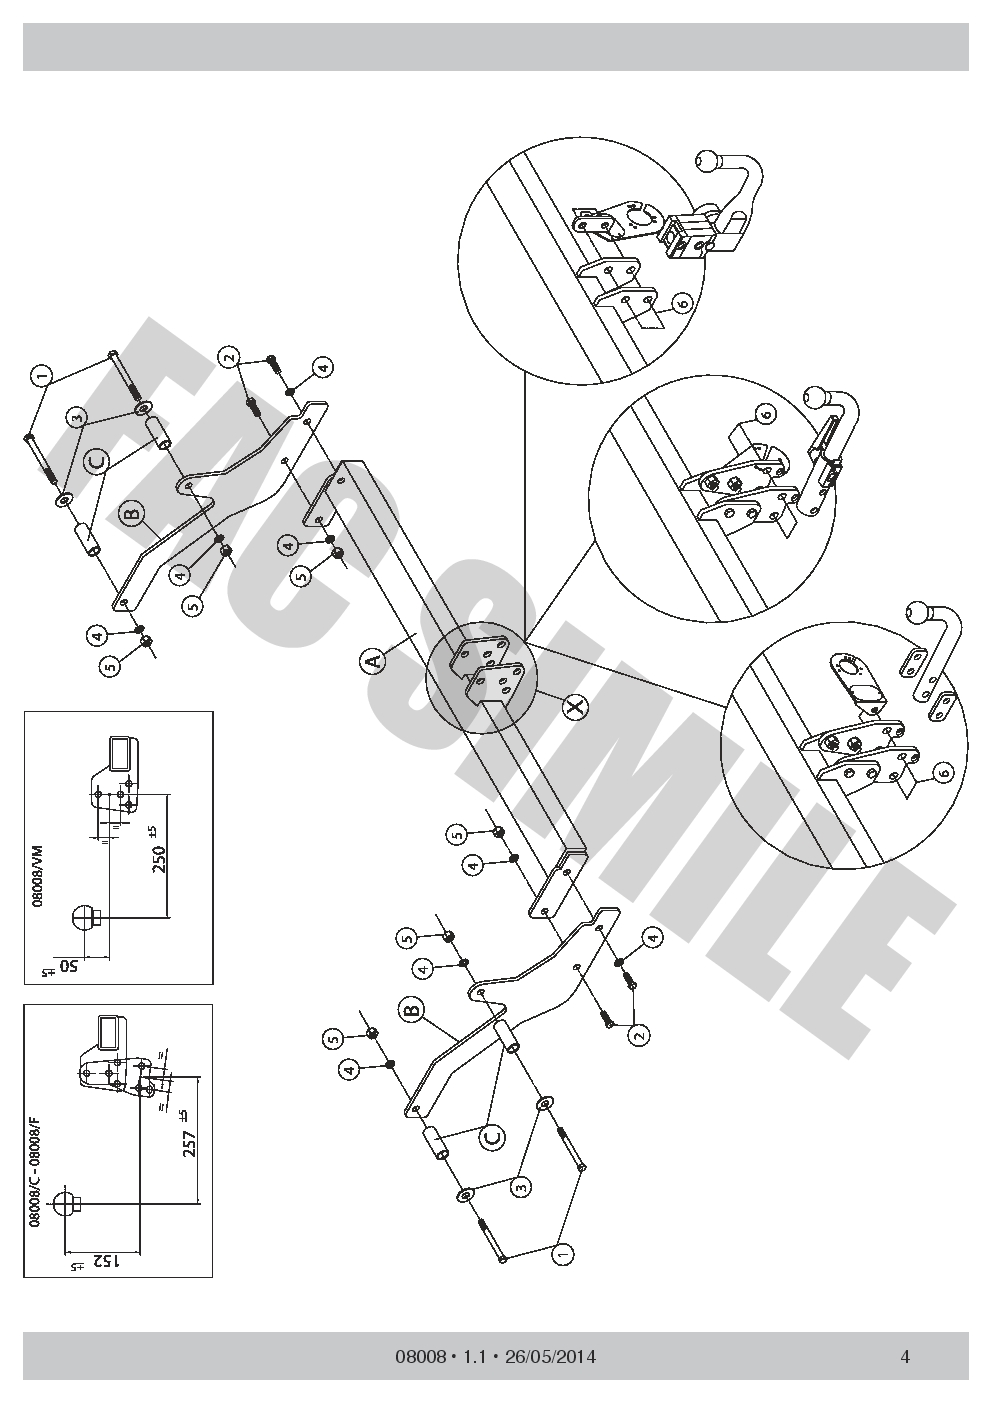 Detachable Towbar 7 Pin Wiring Bypass Relay For Dacia Logan Mcv Electrics Diagram